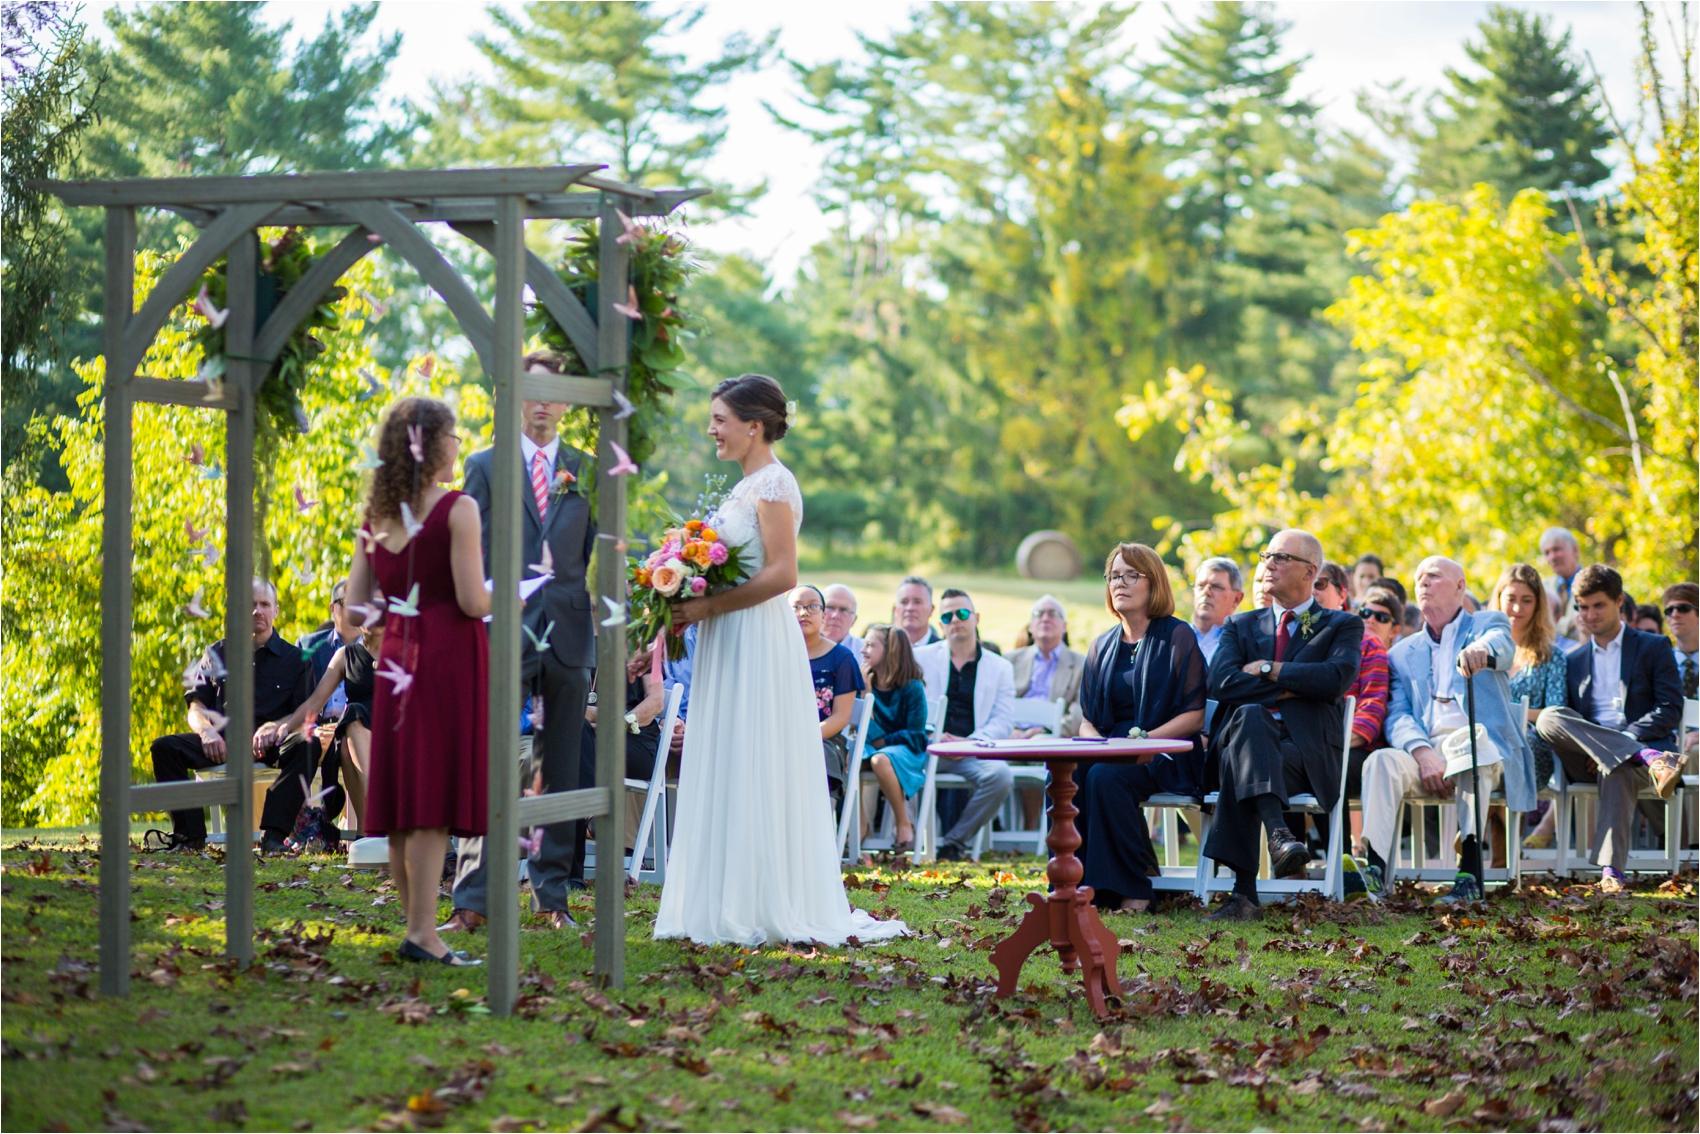 Feather-and-Oak-Rainforest-Trust-Virginia-Wedding-0531.jpg